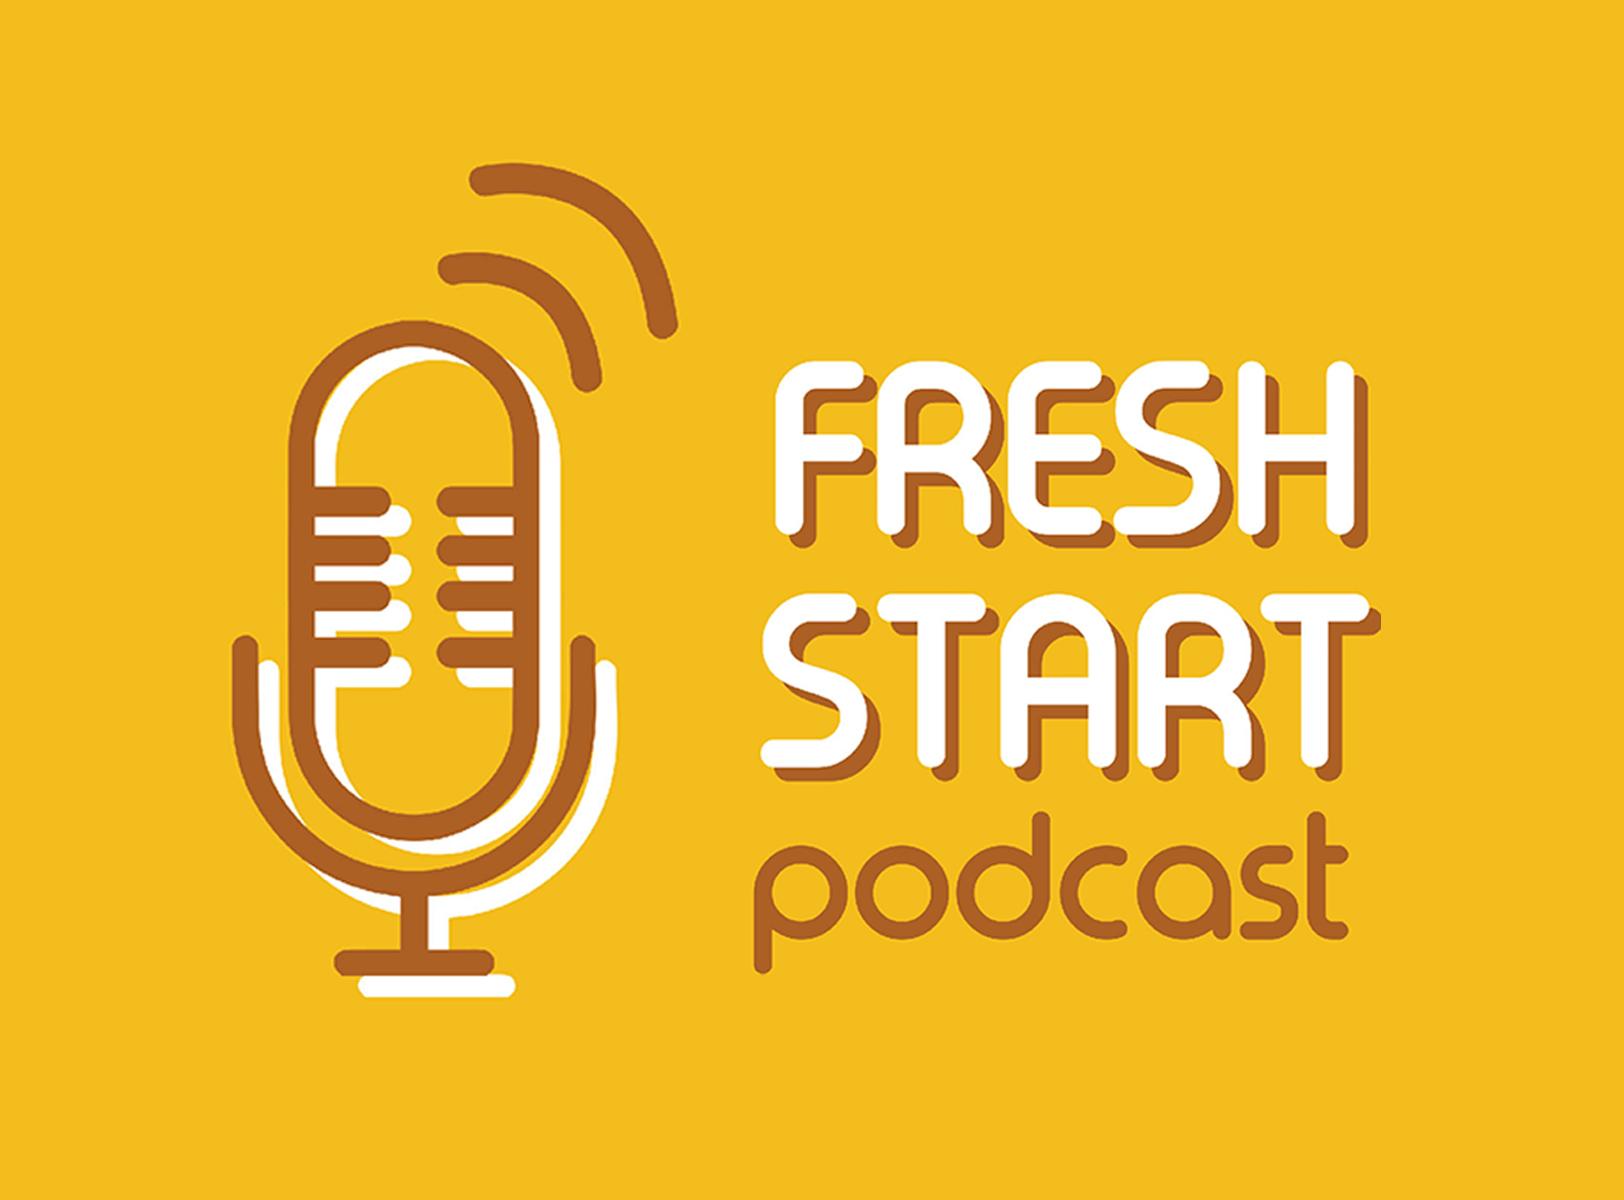 Fresh Start: Podcast News (1/26/2019 Sat.)